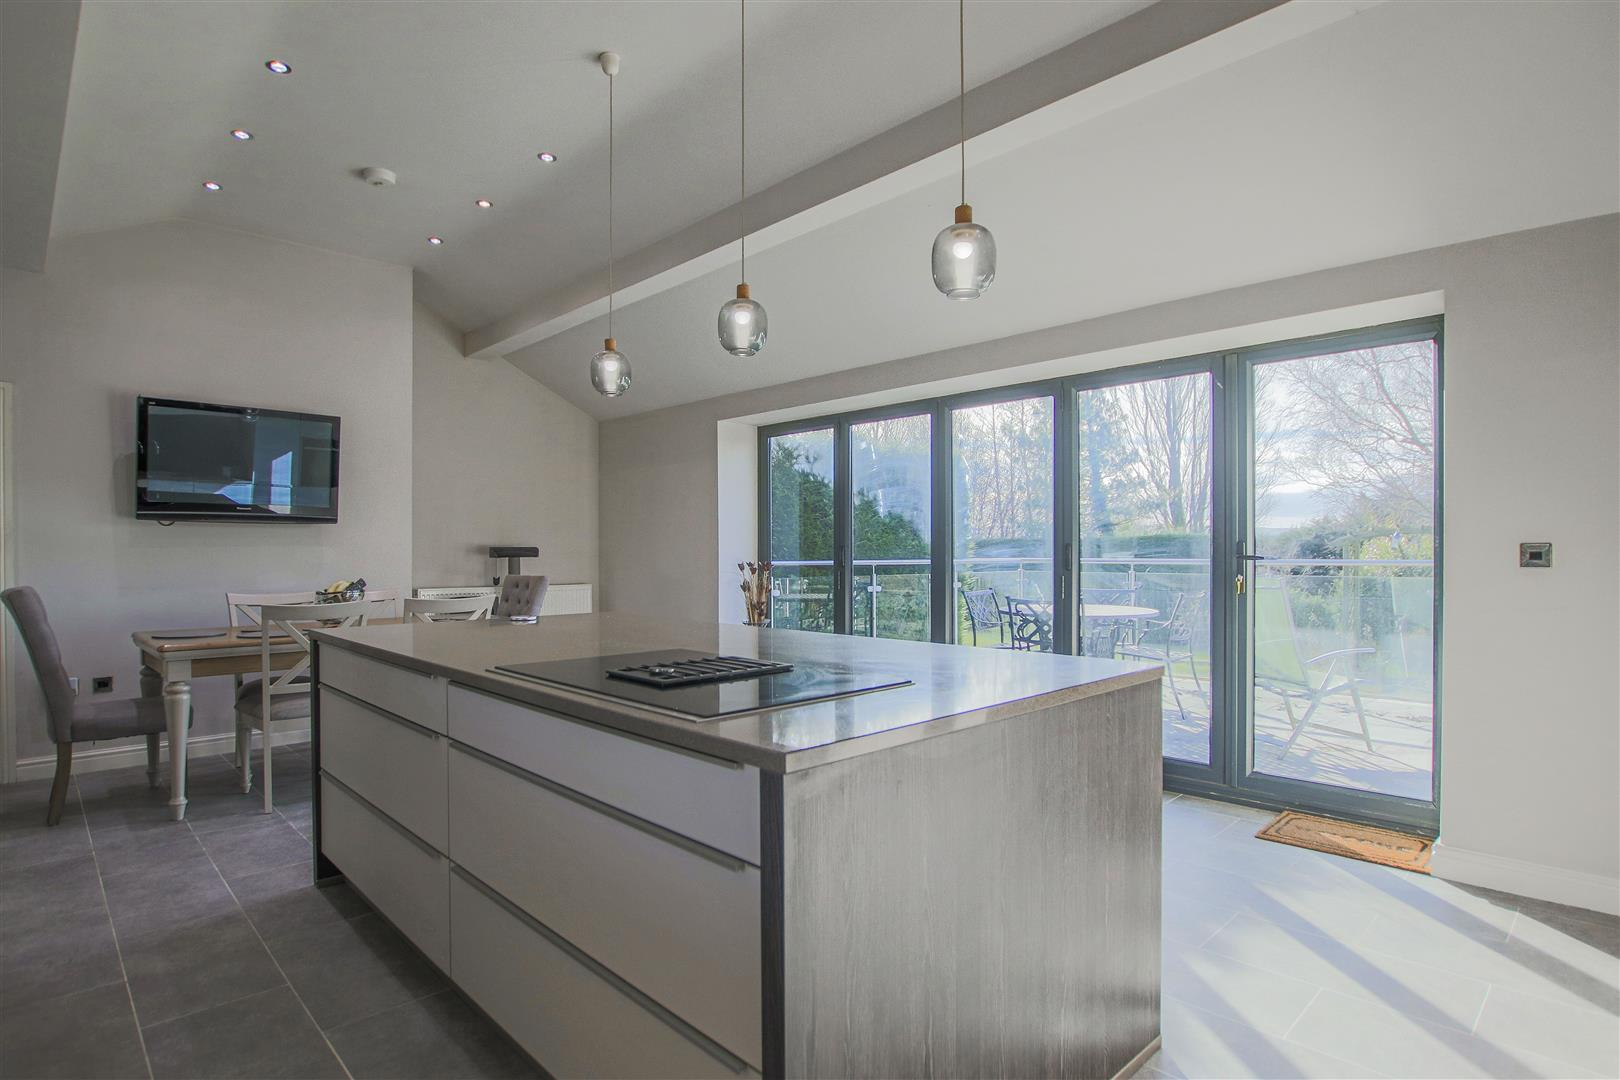 6 Bedroom Barn Conversion For Sale - 22.JPG